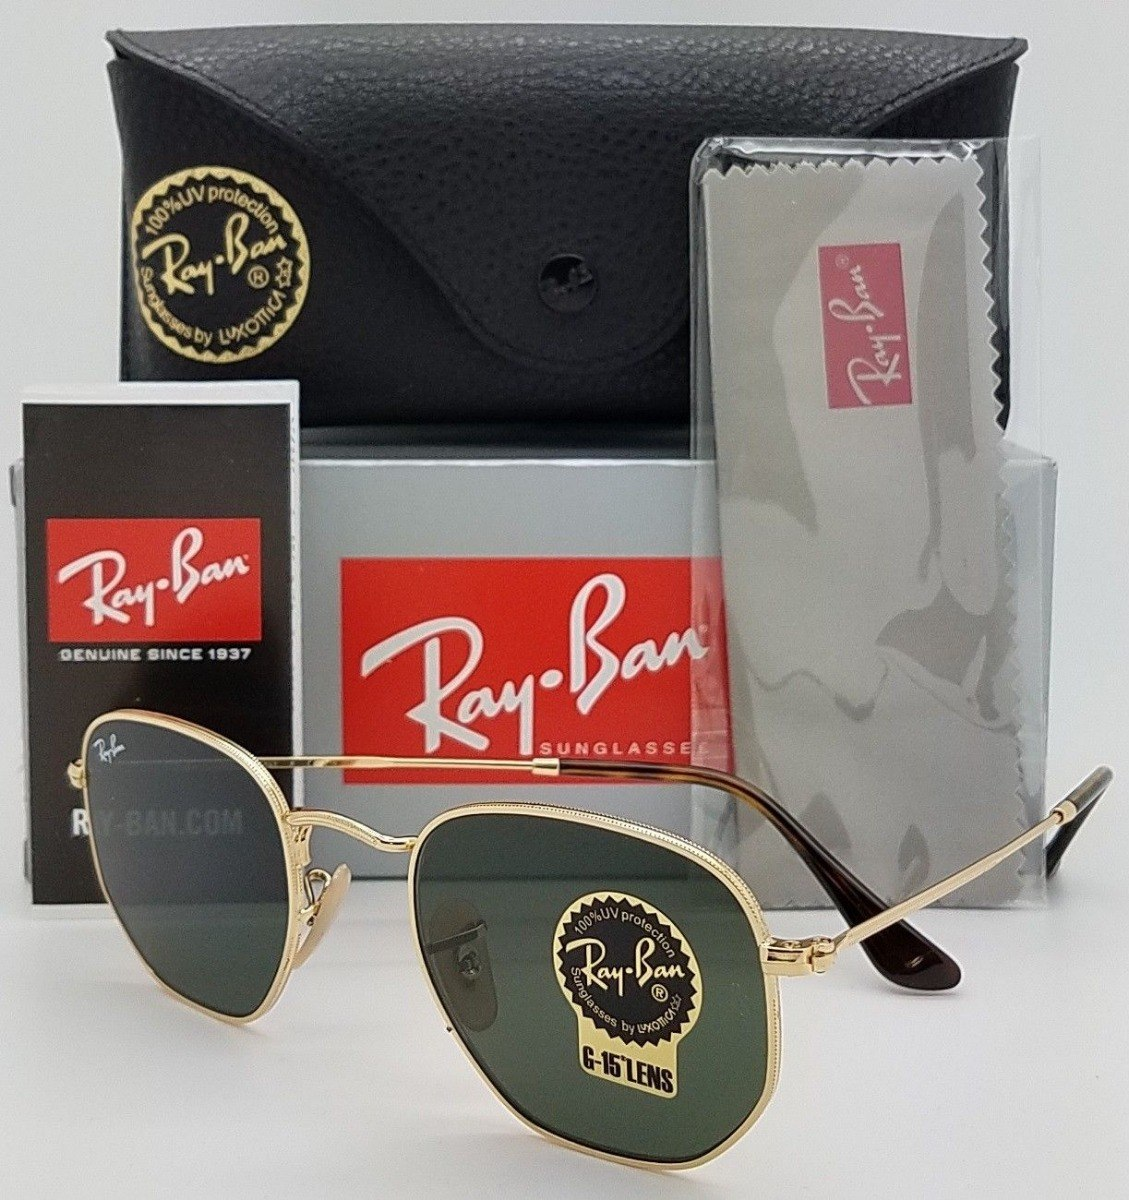 b1a02a7fadfde oculos ray ban rb3548 hexagonal grande 54mm classic g15. Carregando zoom.